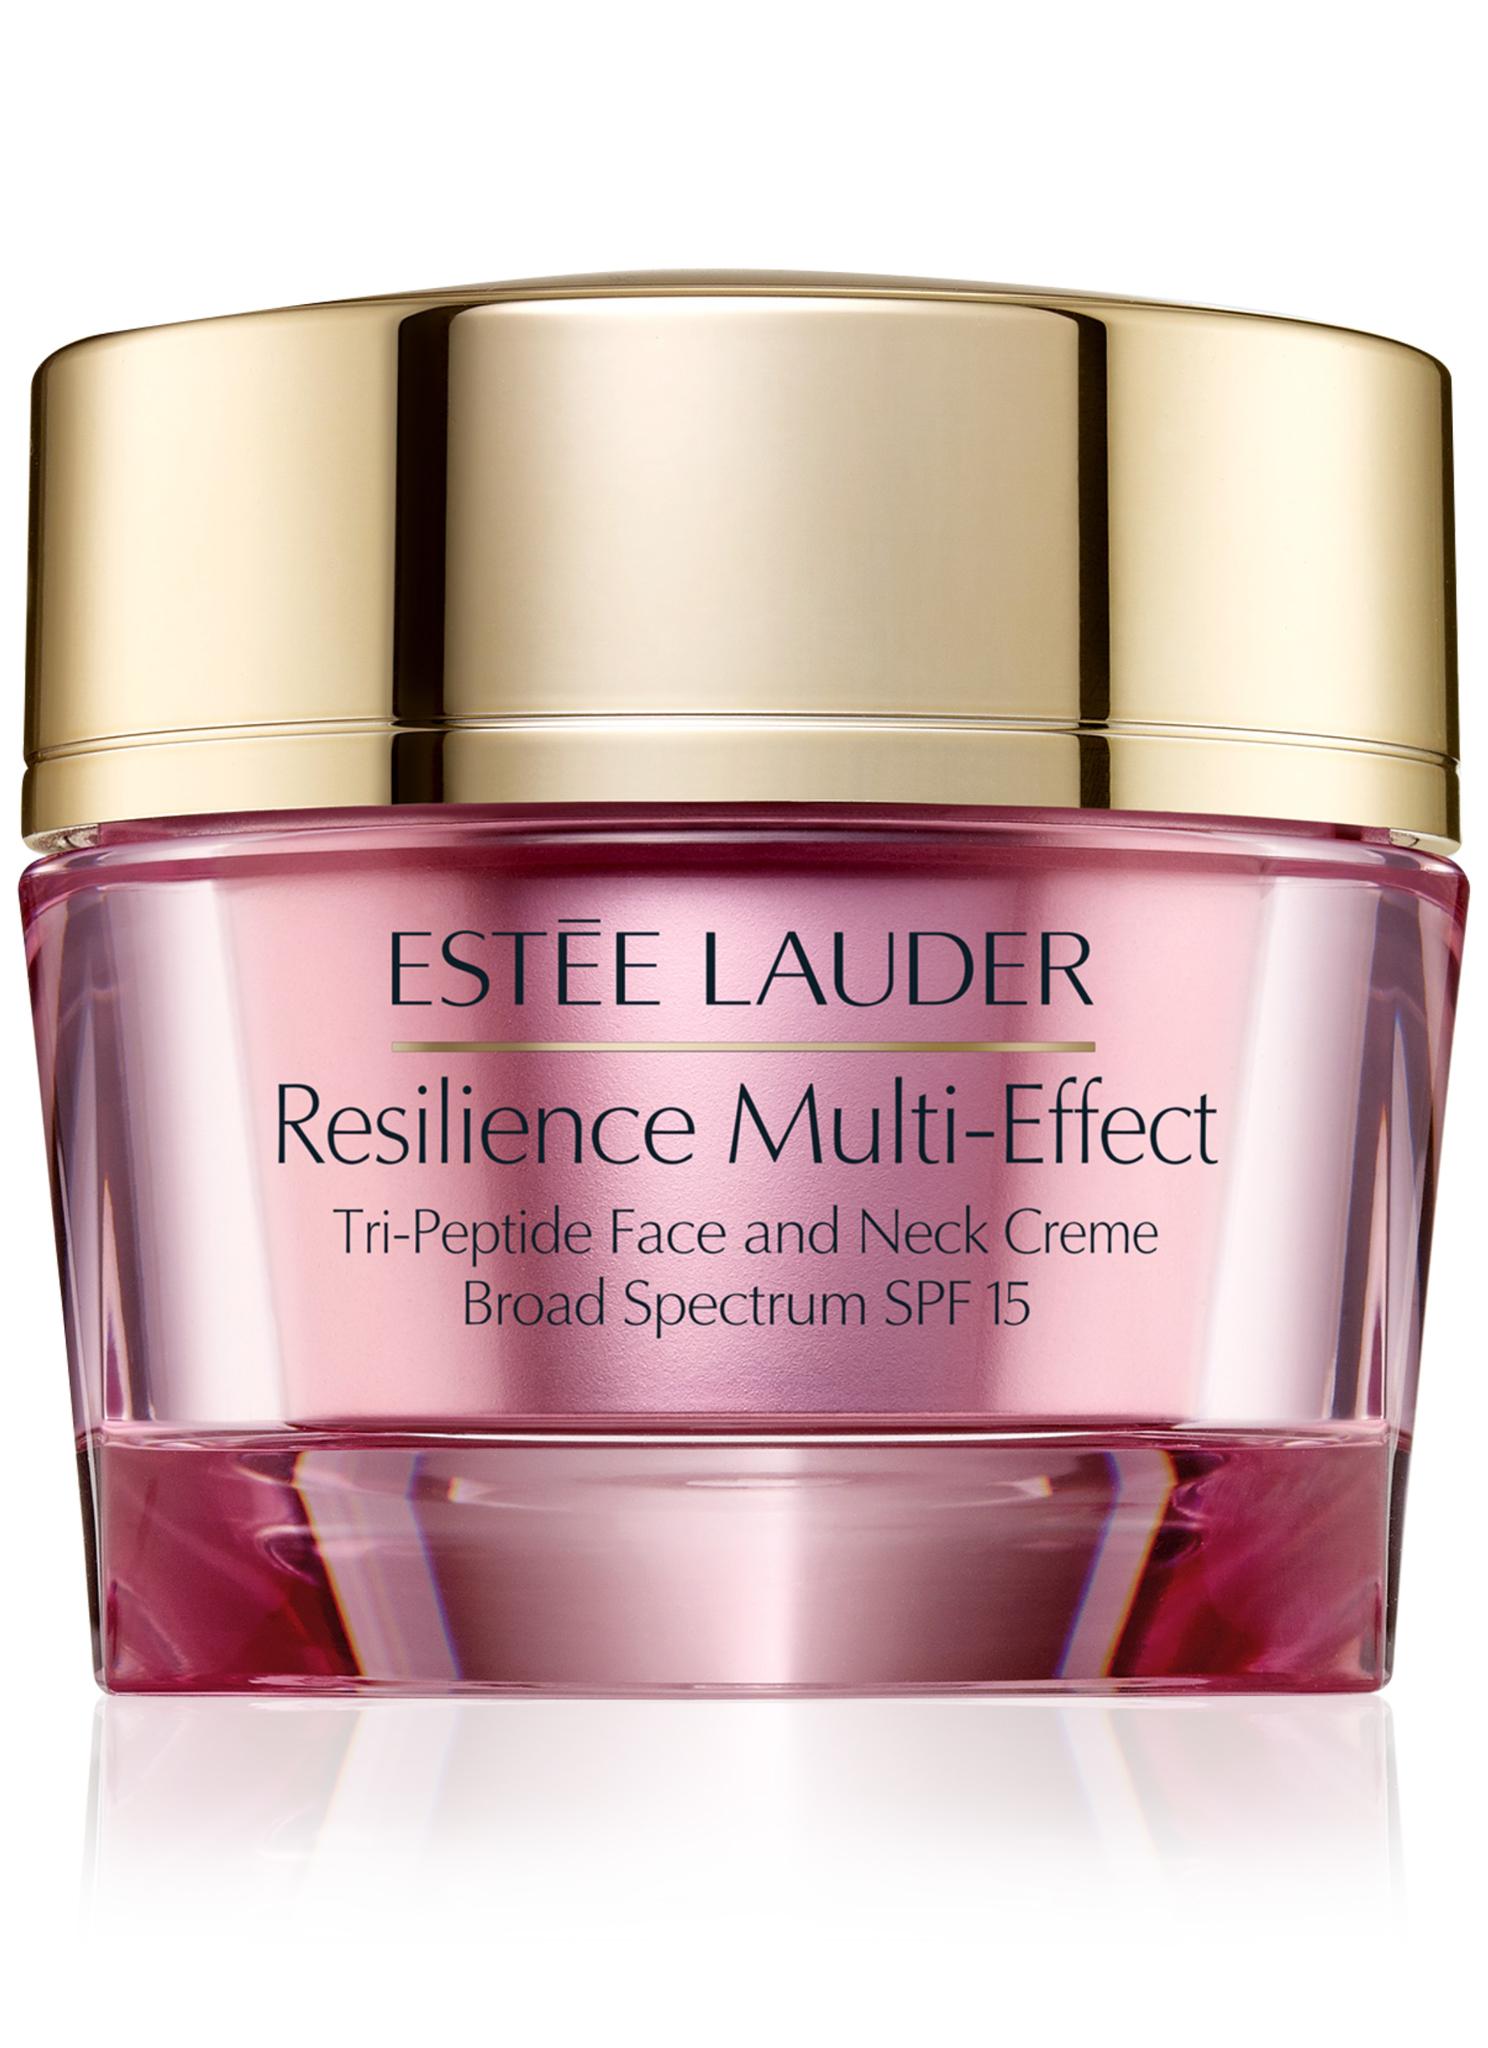 Estée Lauder Resilience Multi-Effect Face & Neck Creme SPF15, dry skin, 50 ml